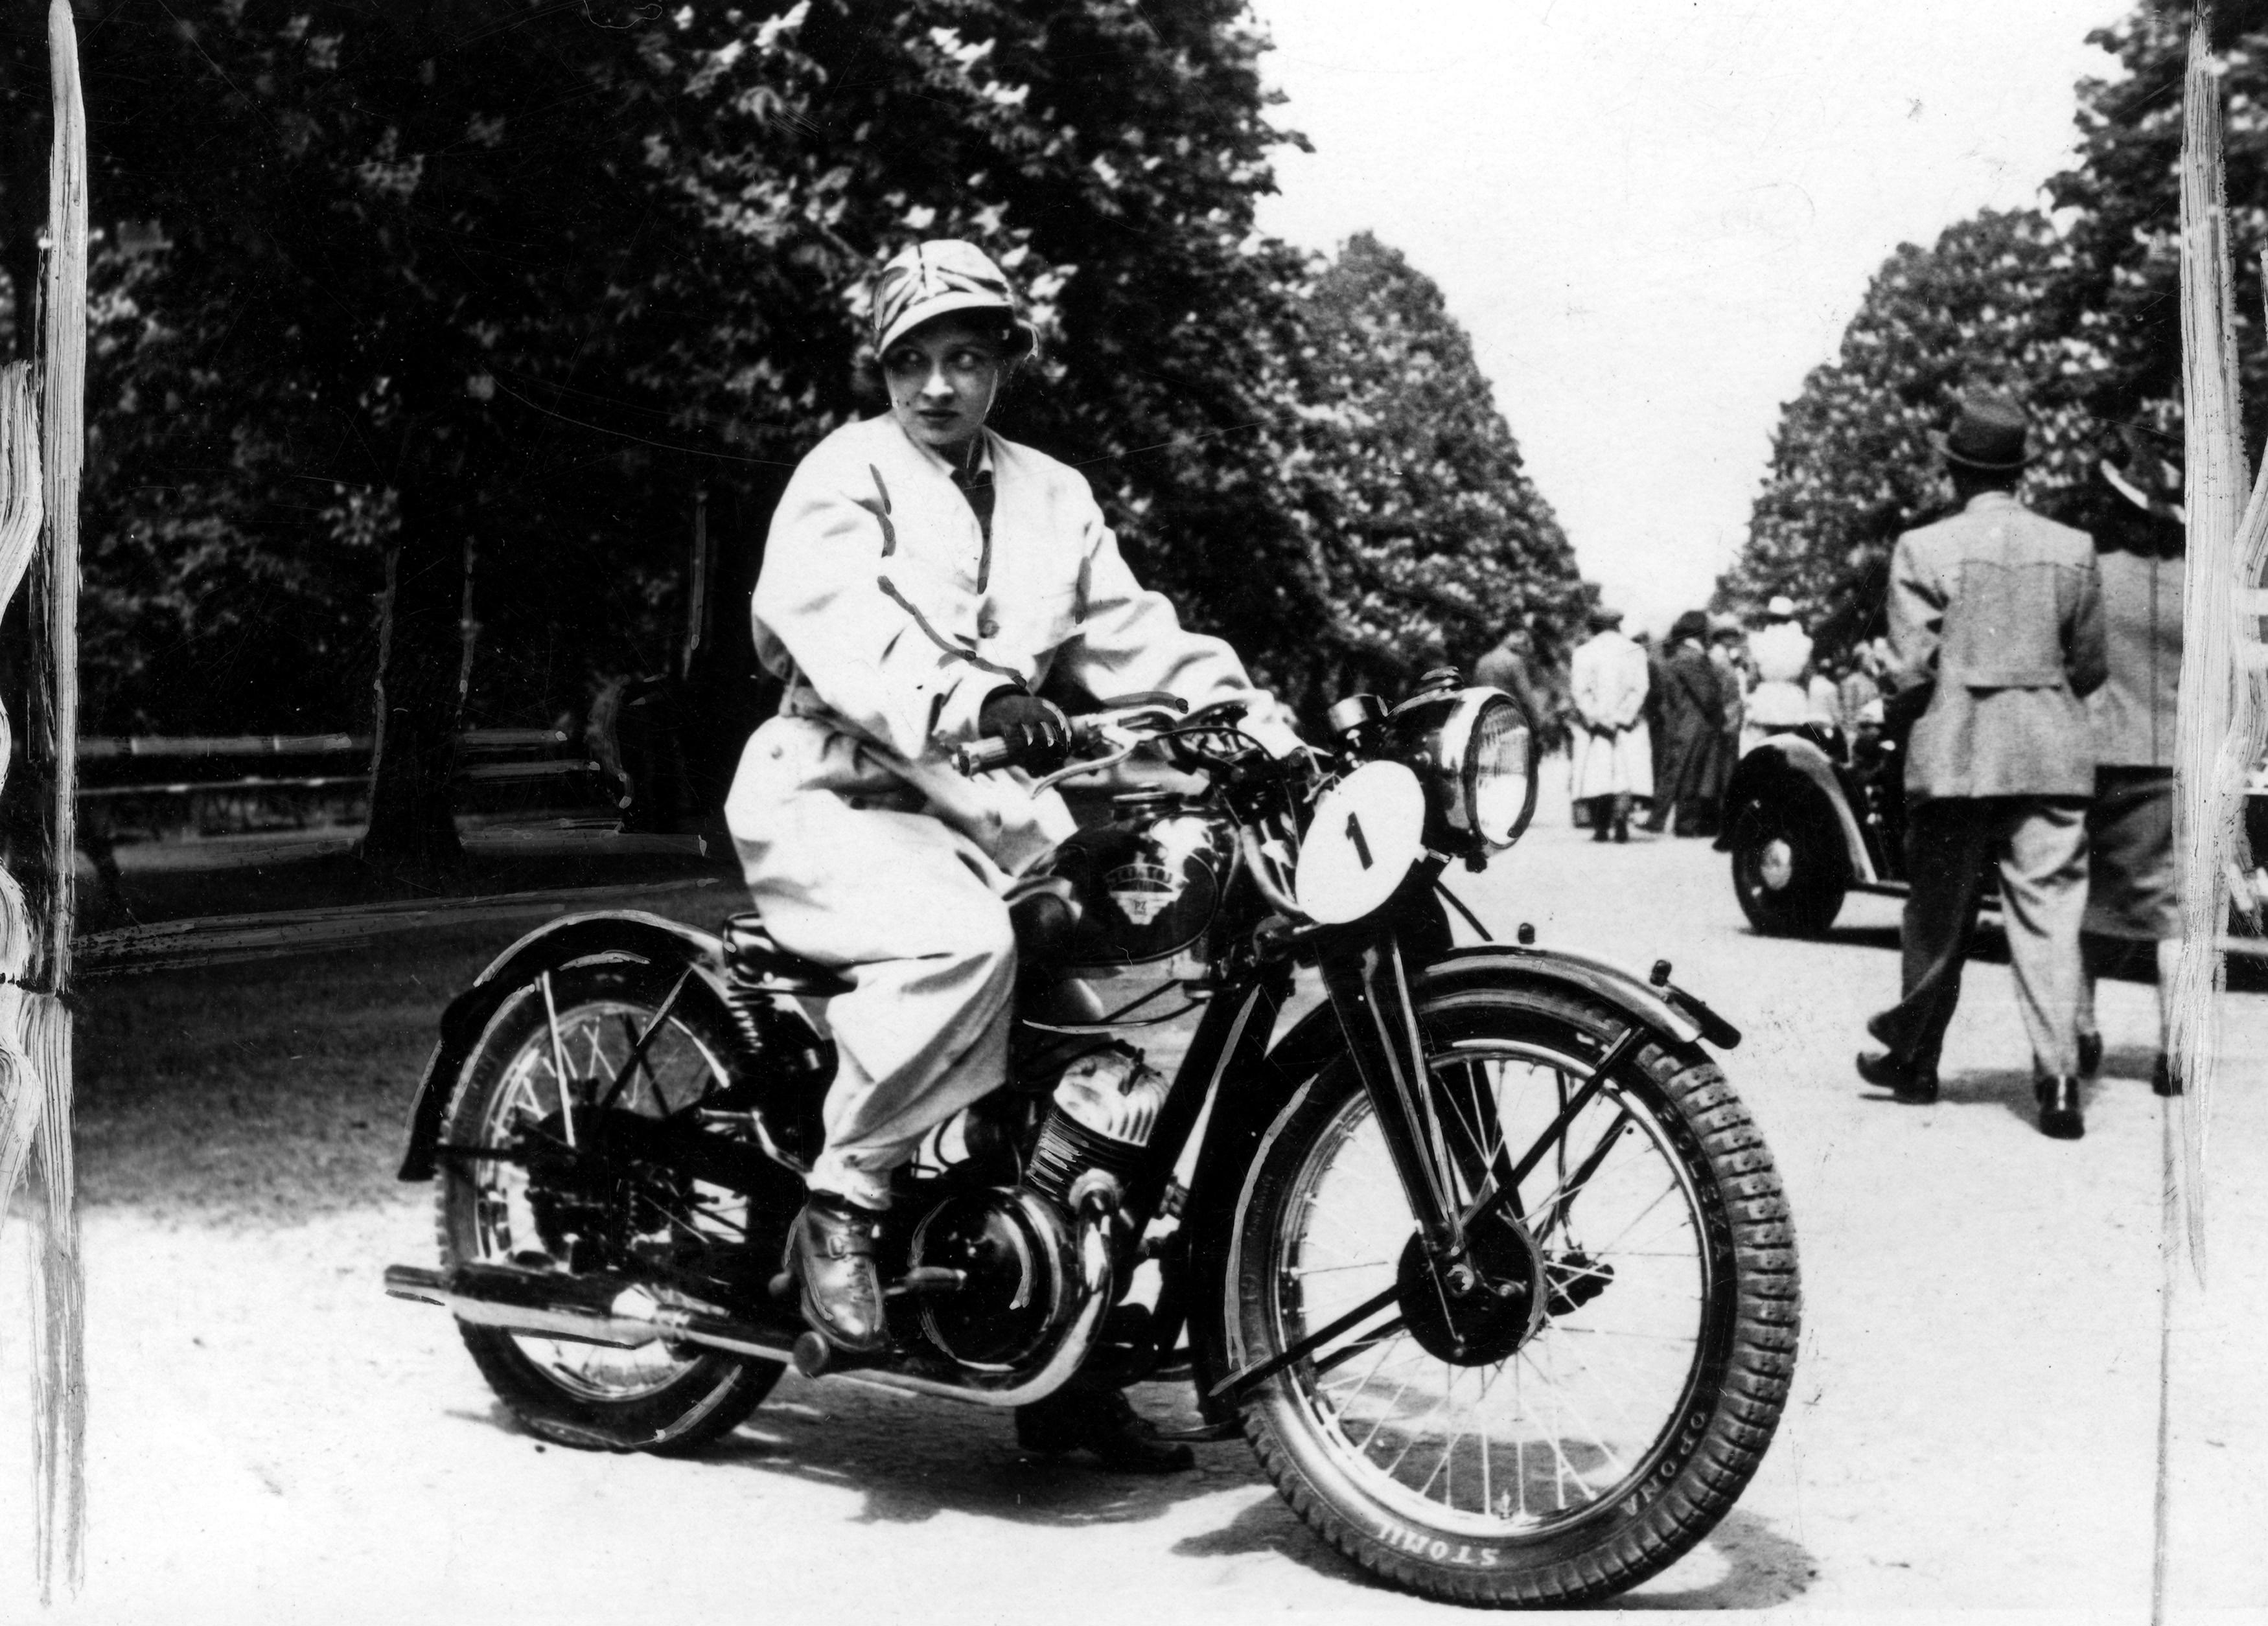 Motocykl_Sok%C3%B3%C5%82_200.jpg